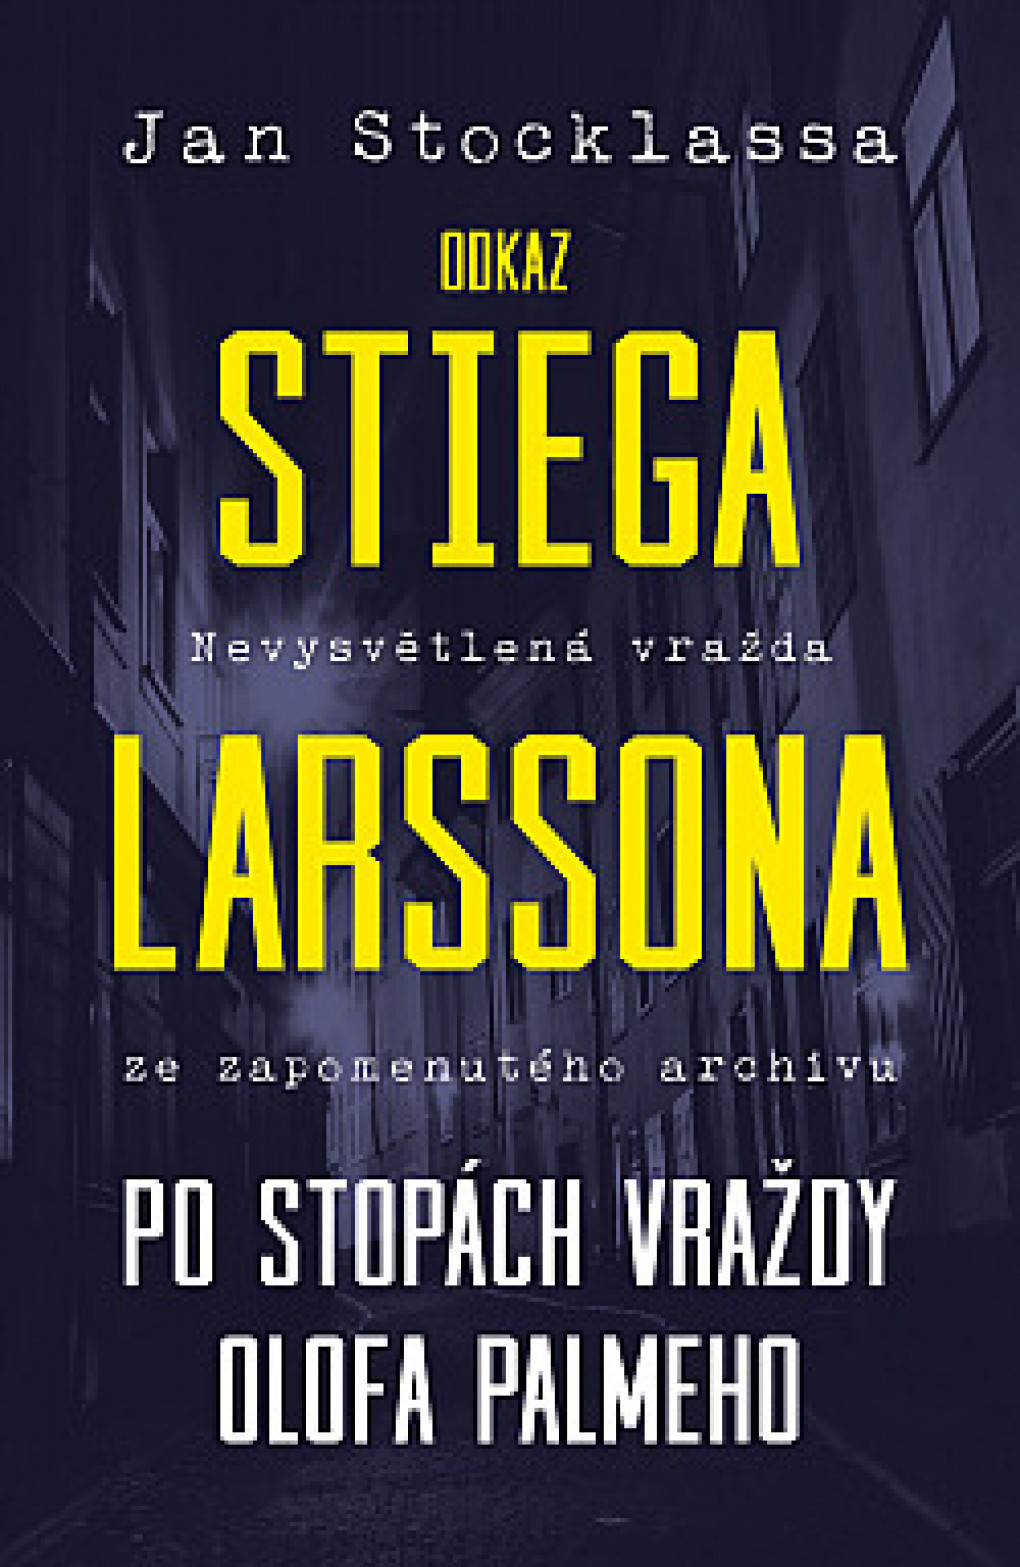 odkaz-stiega-larssona-po-stopach-vr-dpa-399366.jpg